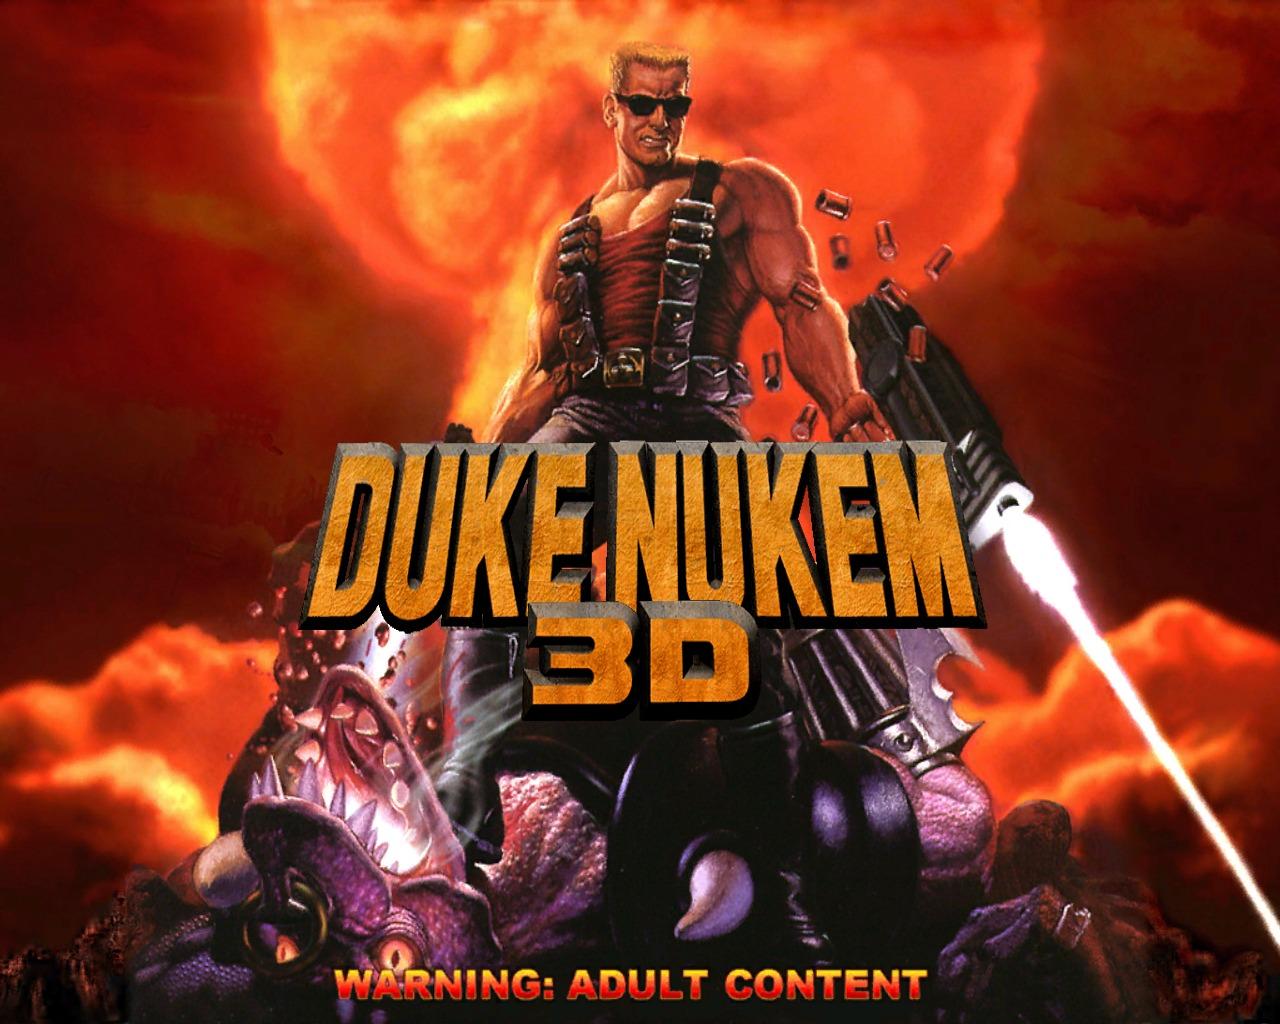 Je suis Bansaa Duke-Nukem-3D-Fond-d-ecran